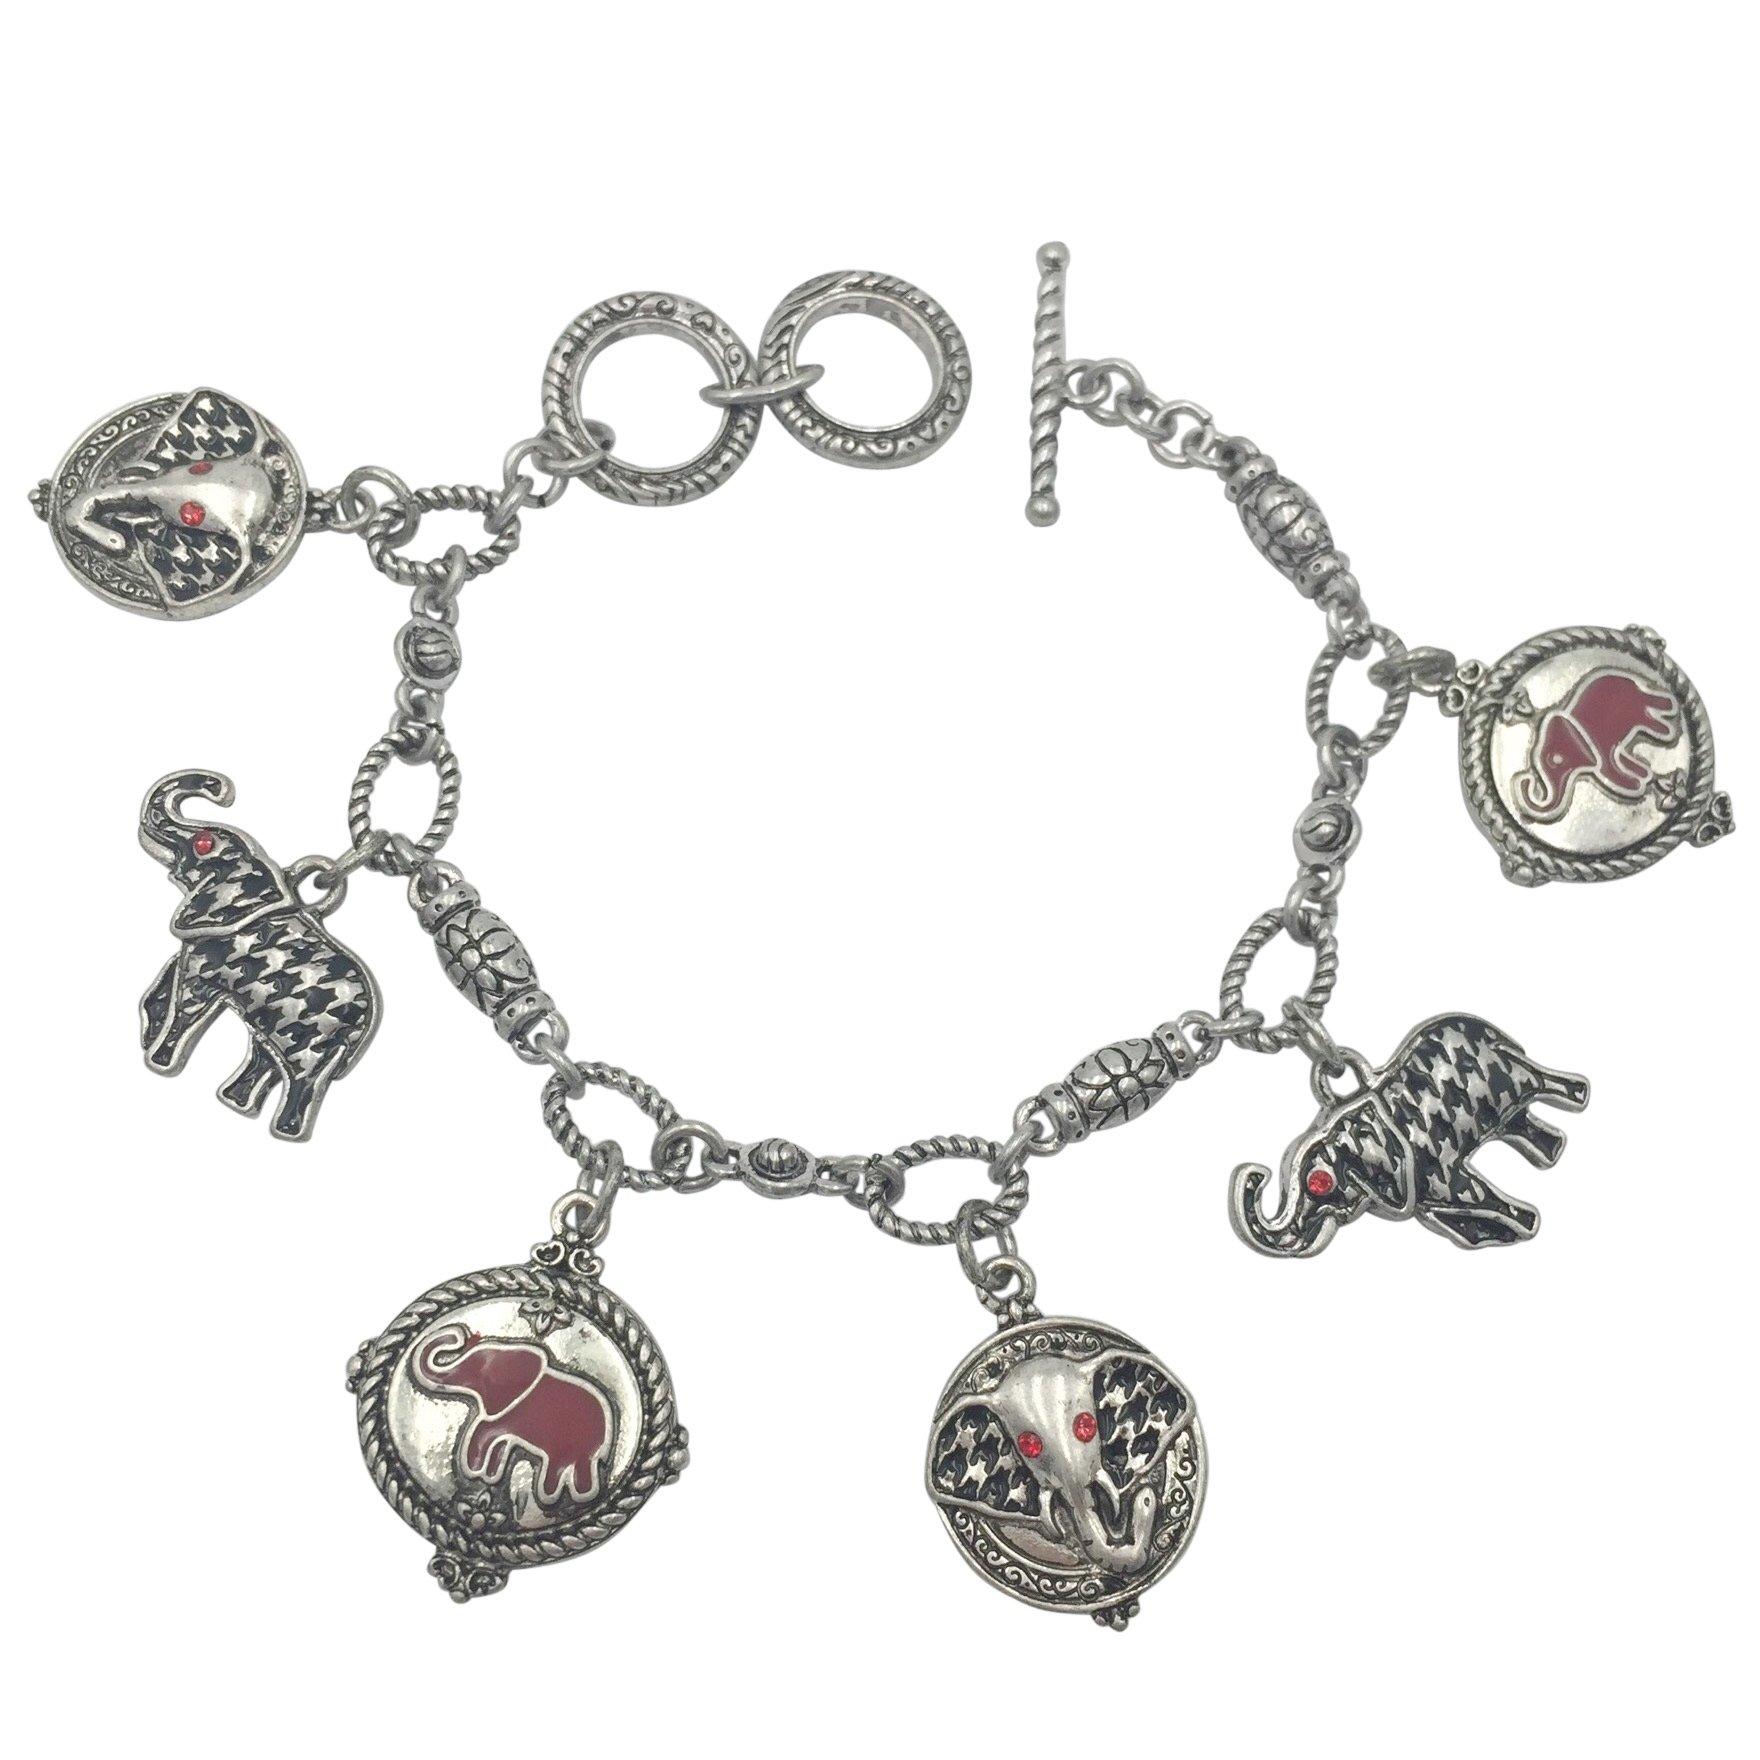 Houndstooth & Red Elephant Charm Bracelet Alabama Roll Tide Pride (Silver Tone)